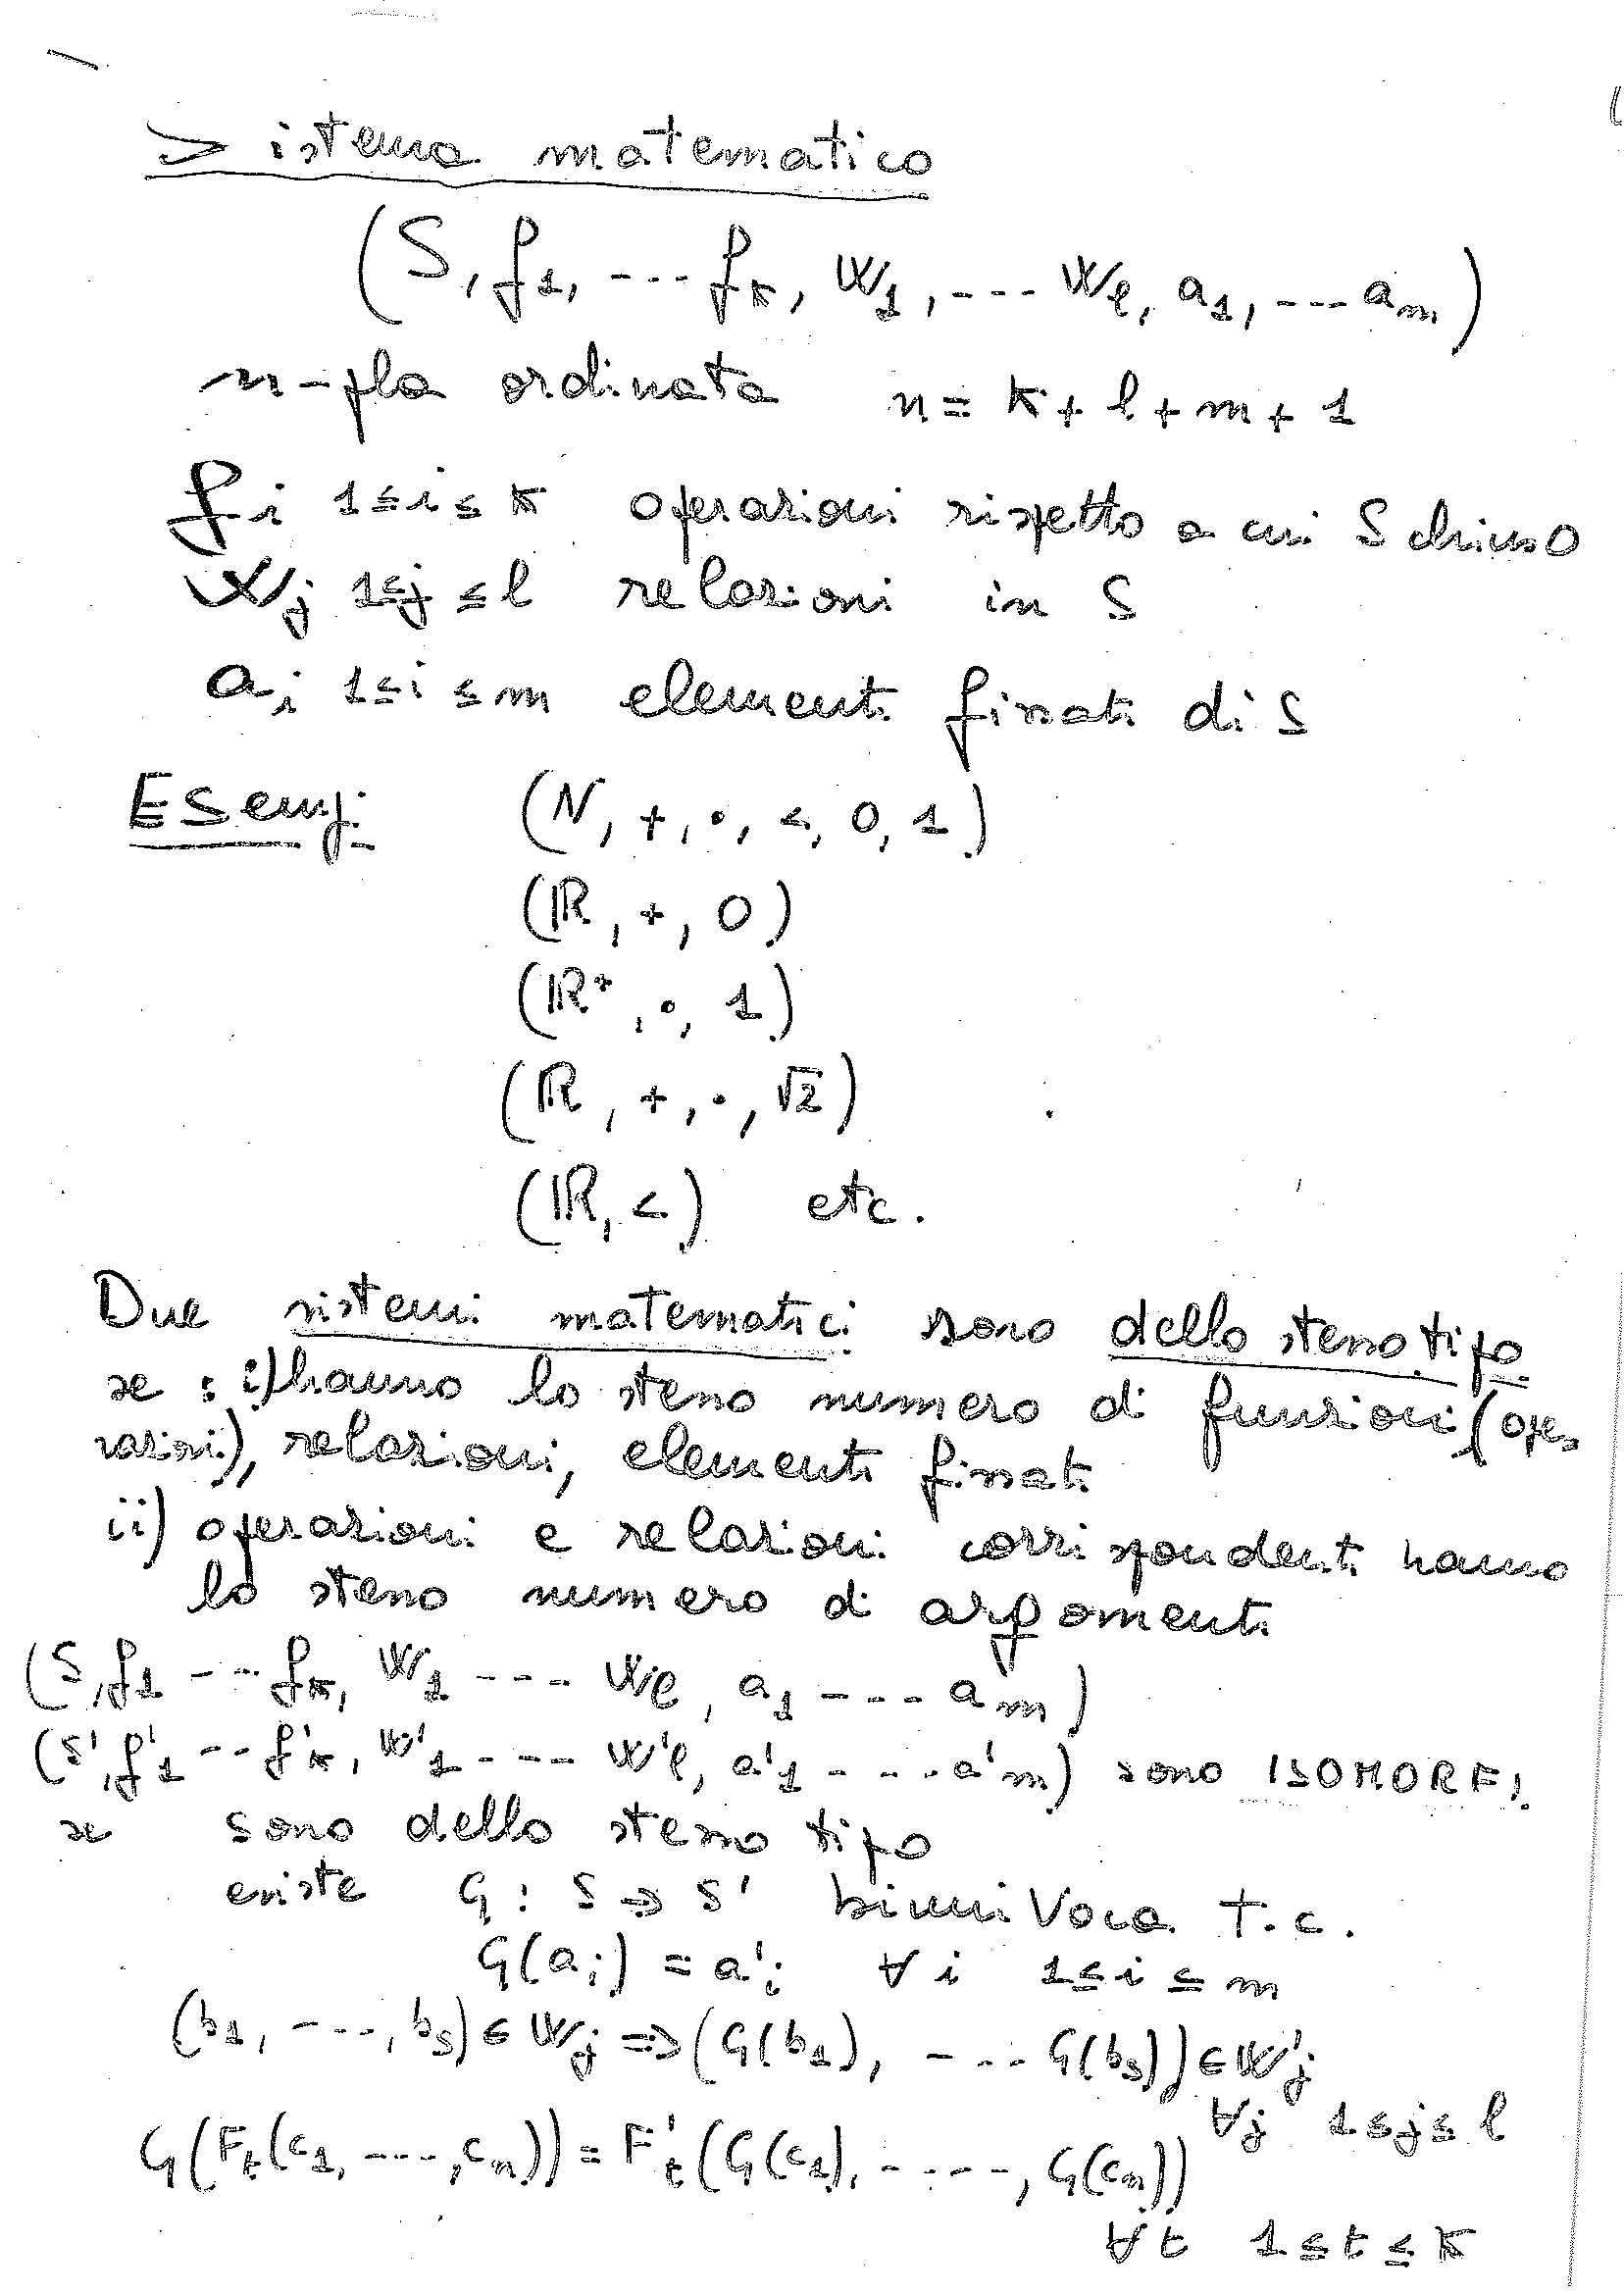 Sistemi matematici